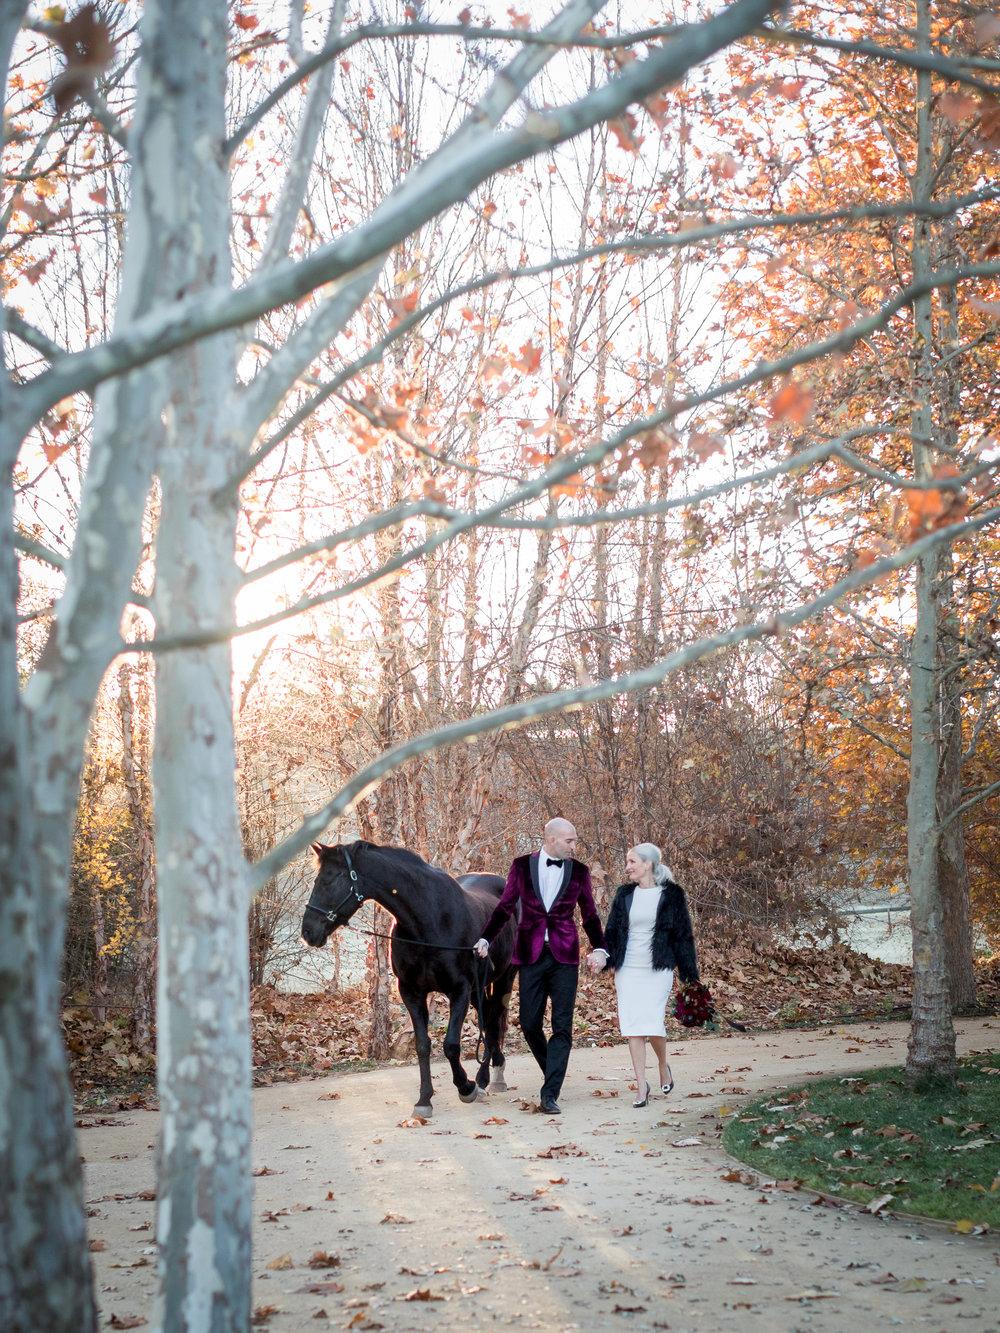 www.santabarbarawedding.com | Kiel Rucker | Santa Barbara Elopement | Kestrel Park | Bride and Groom and Horse